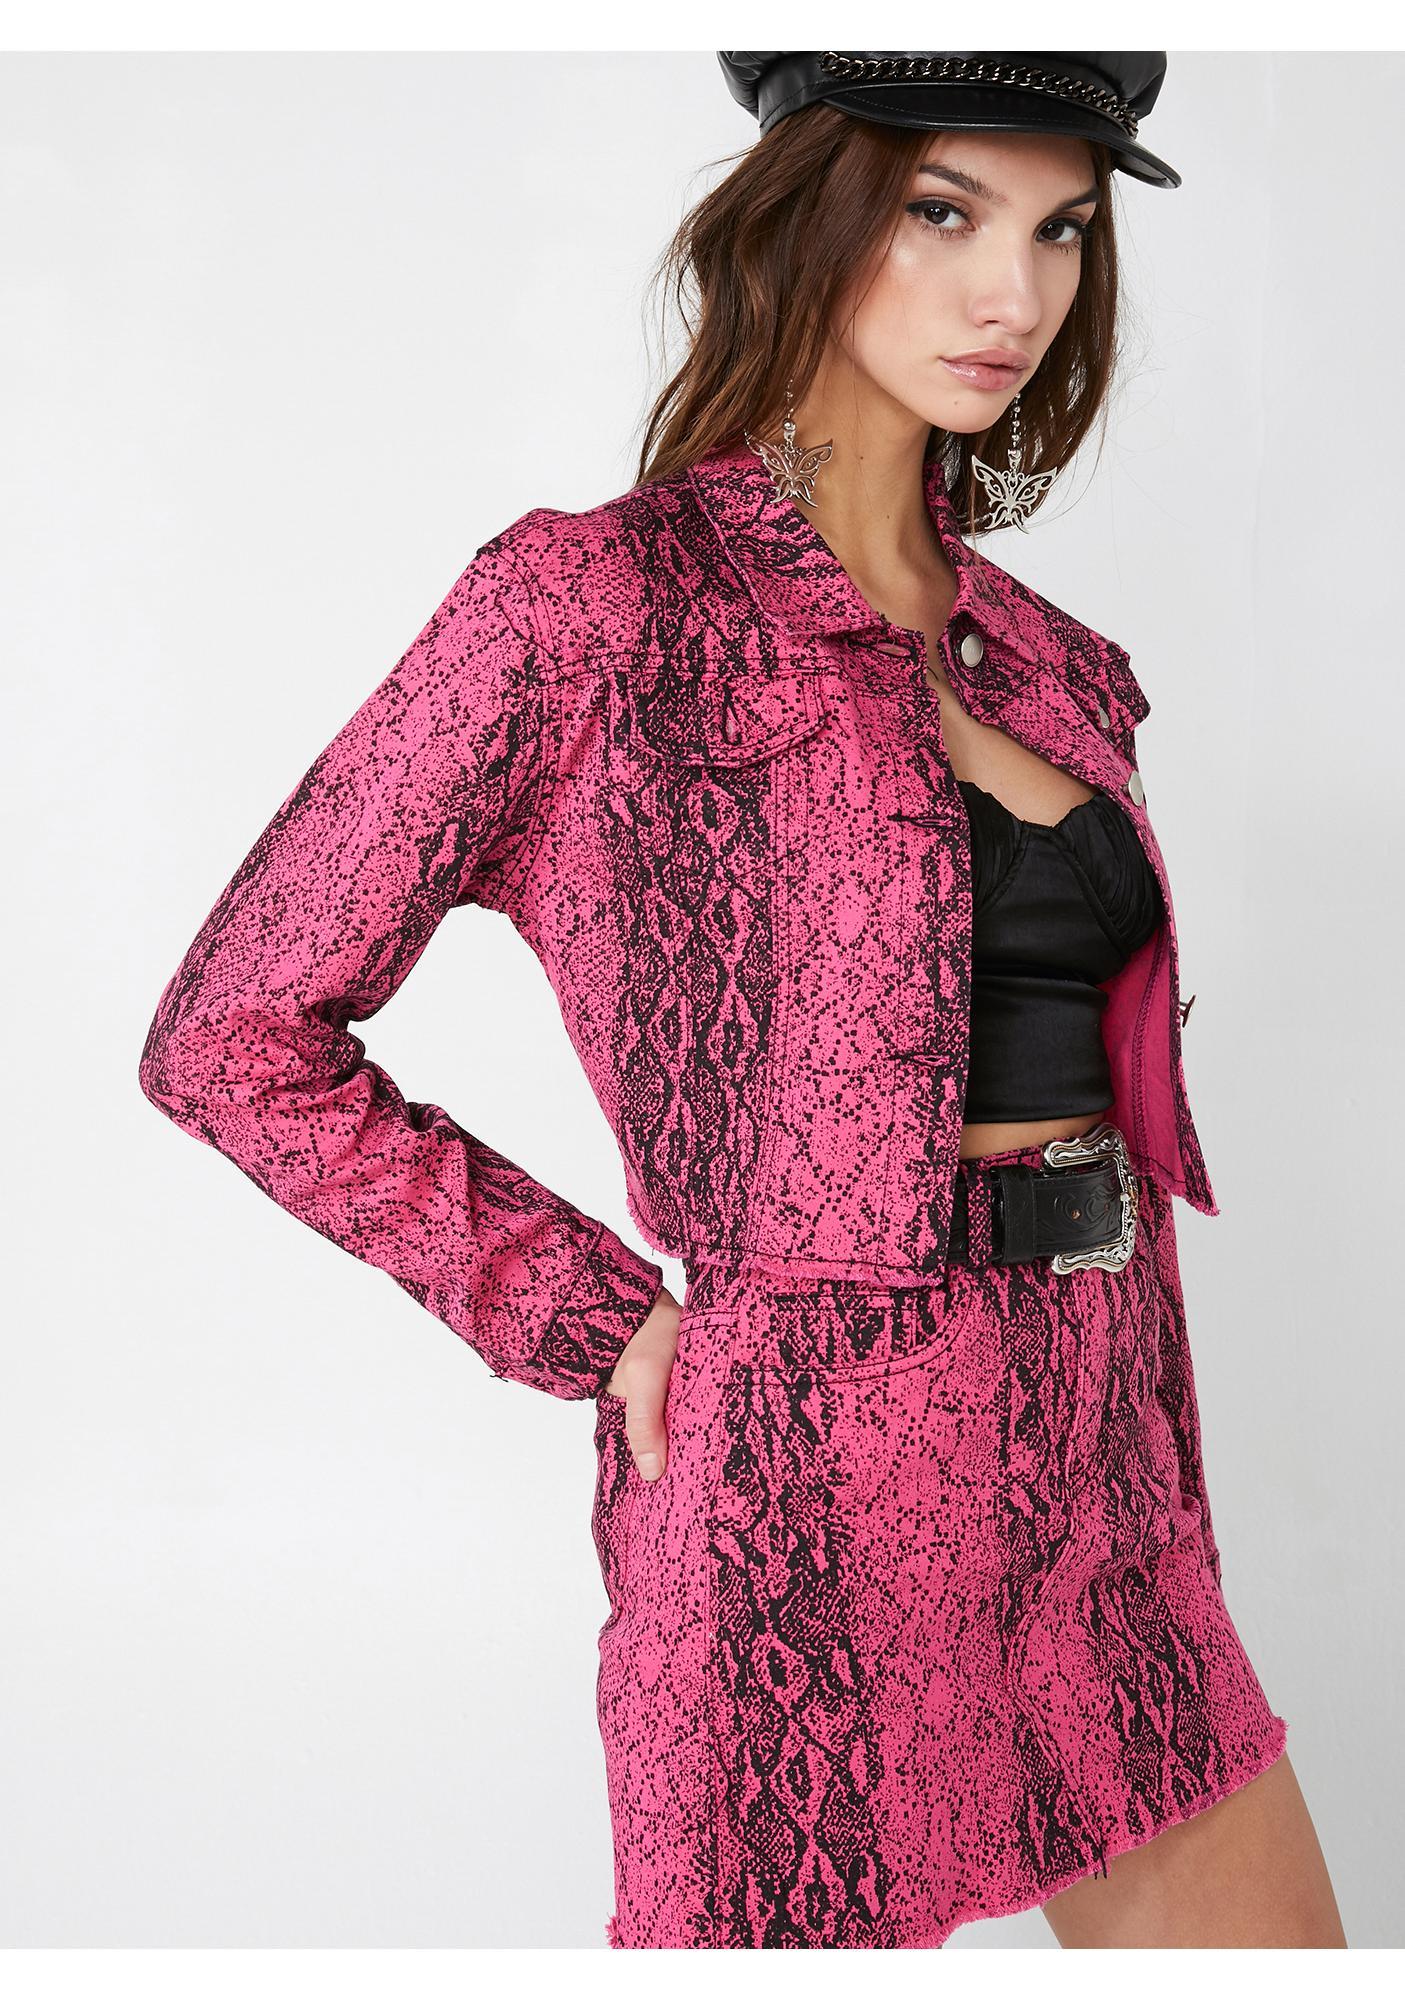 Lady Danger Snakeskin Jacket